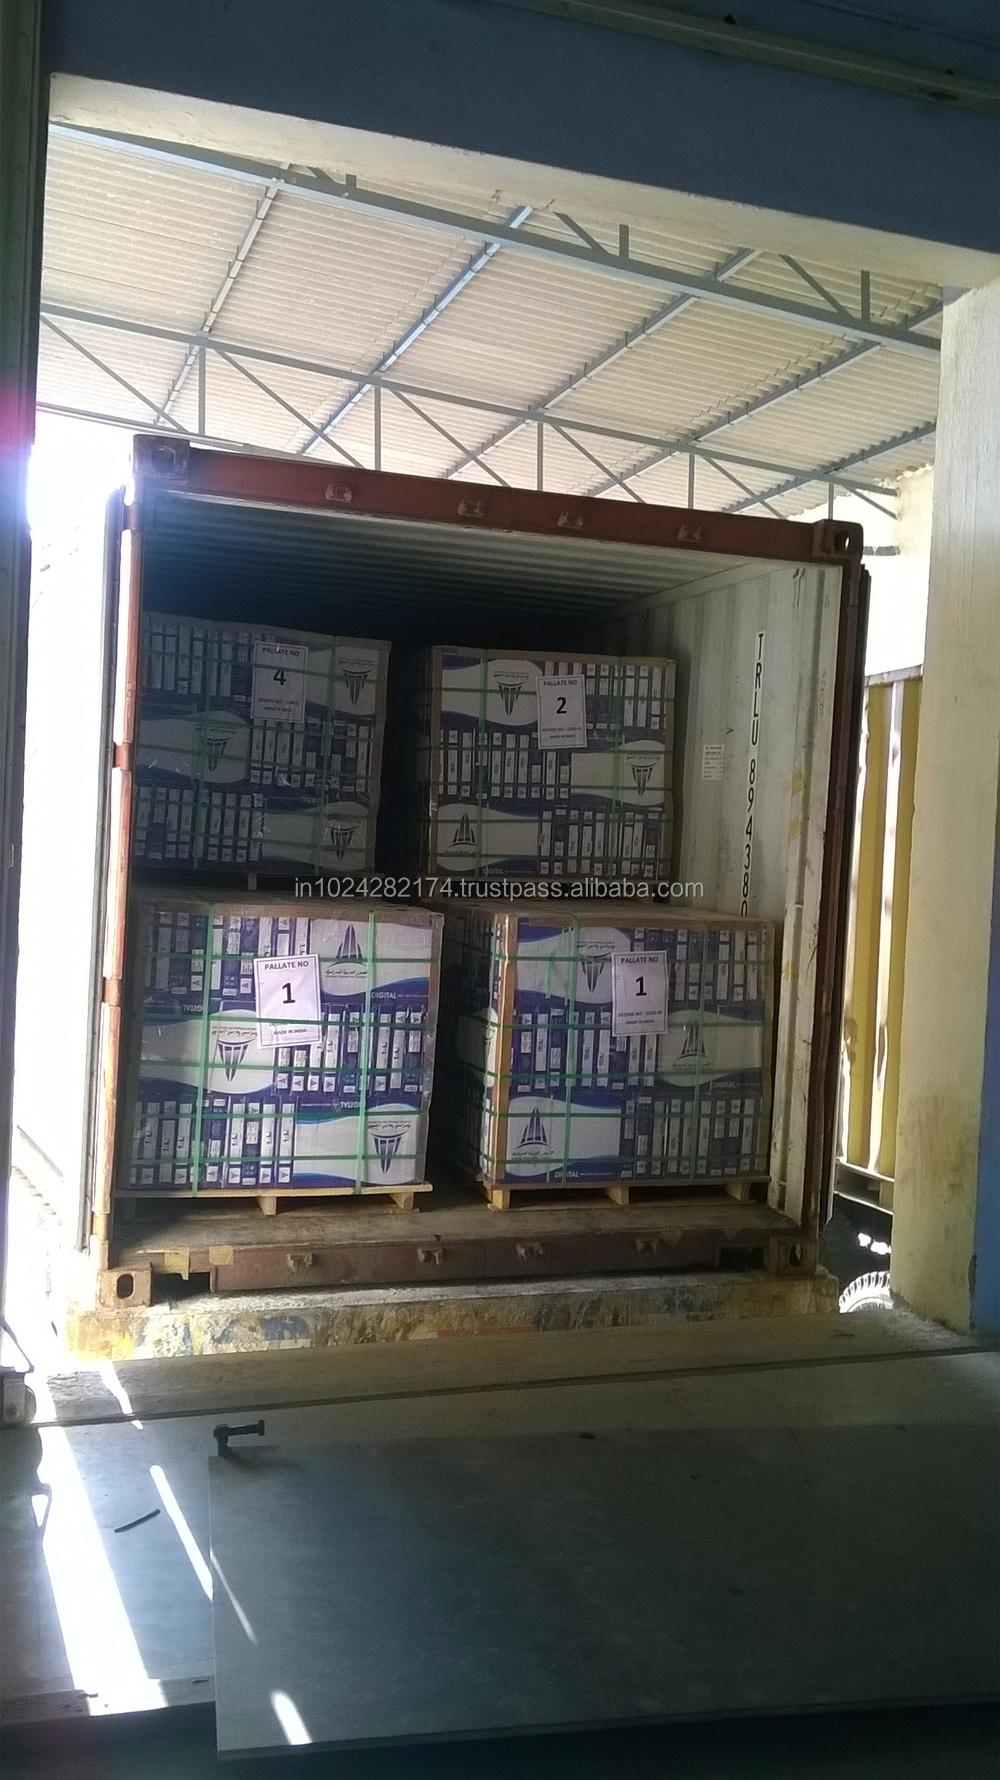 Nigeria to export ceramic tiles official premium times nigeria - Hot Sale Bathroom 3d Inkjet Digital Ceramic Wall Tiles For Nigeria Projects 5005